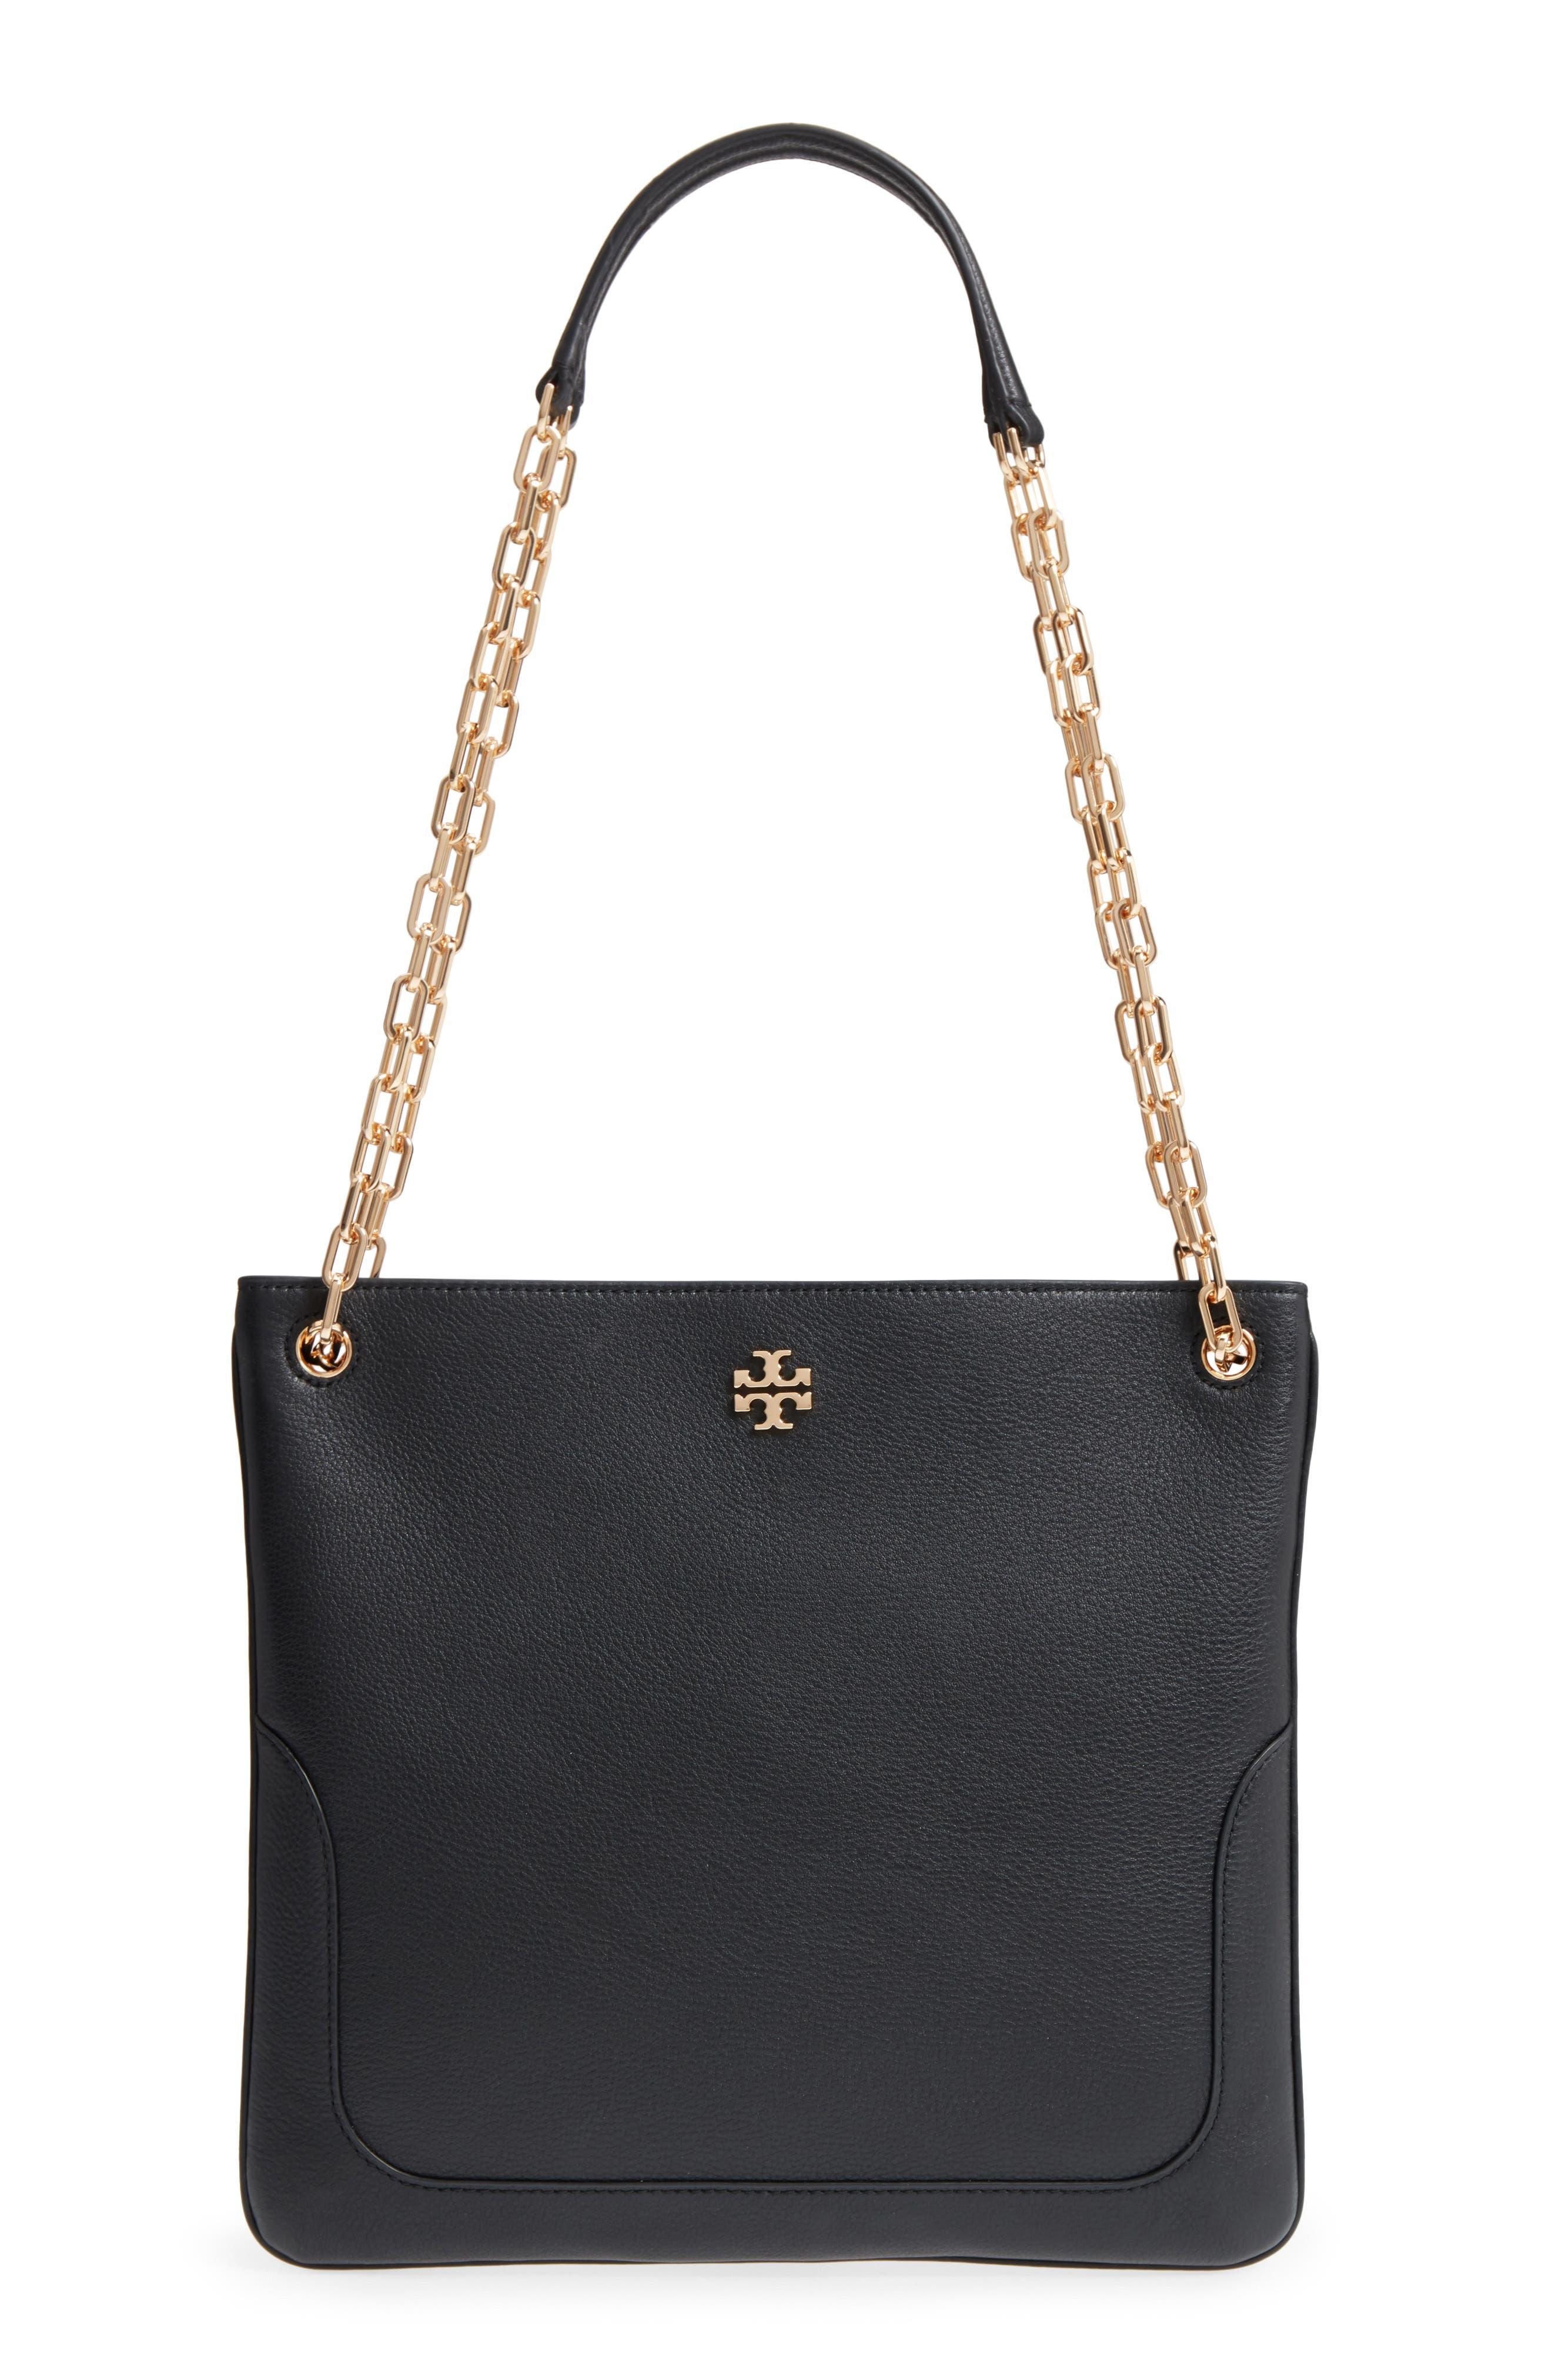 TORY BURCH, Marsden Swingpack Leather Crossbody Bag, Main thumbnail 1, color, 001